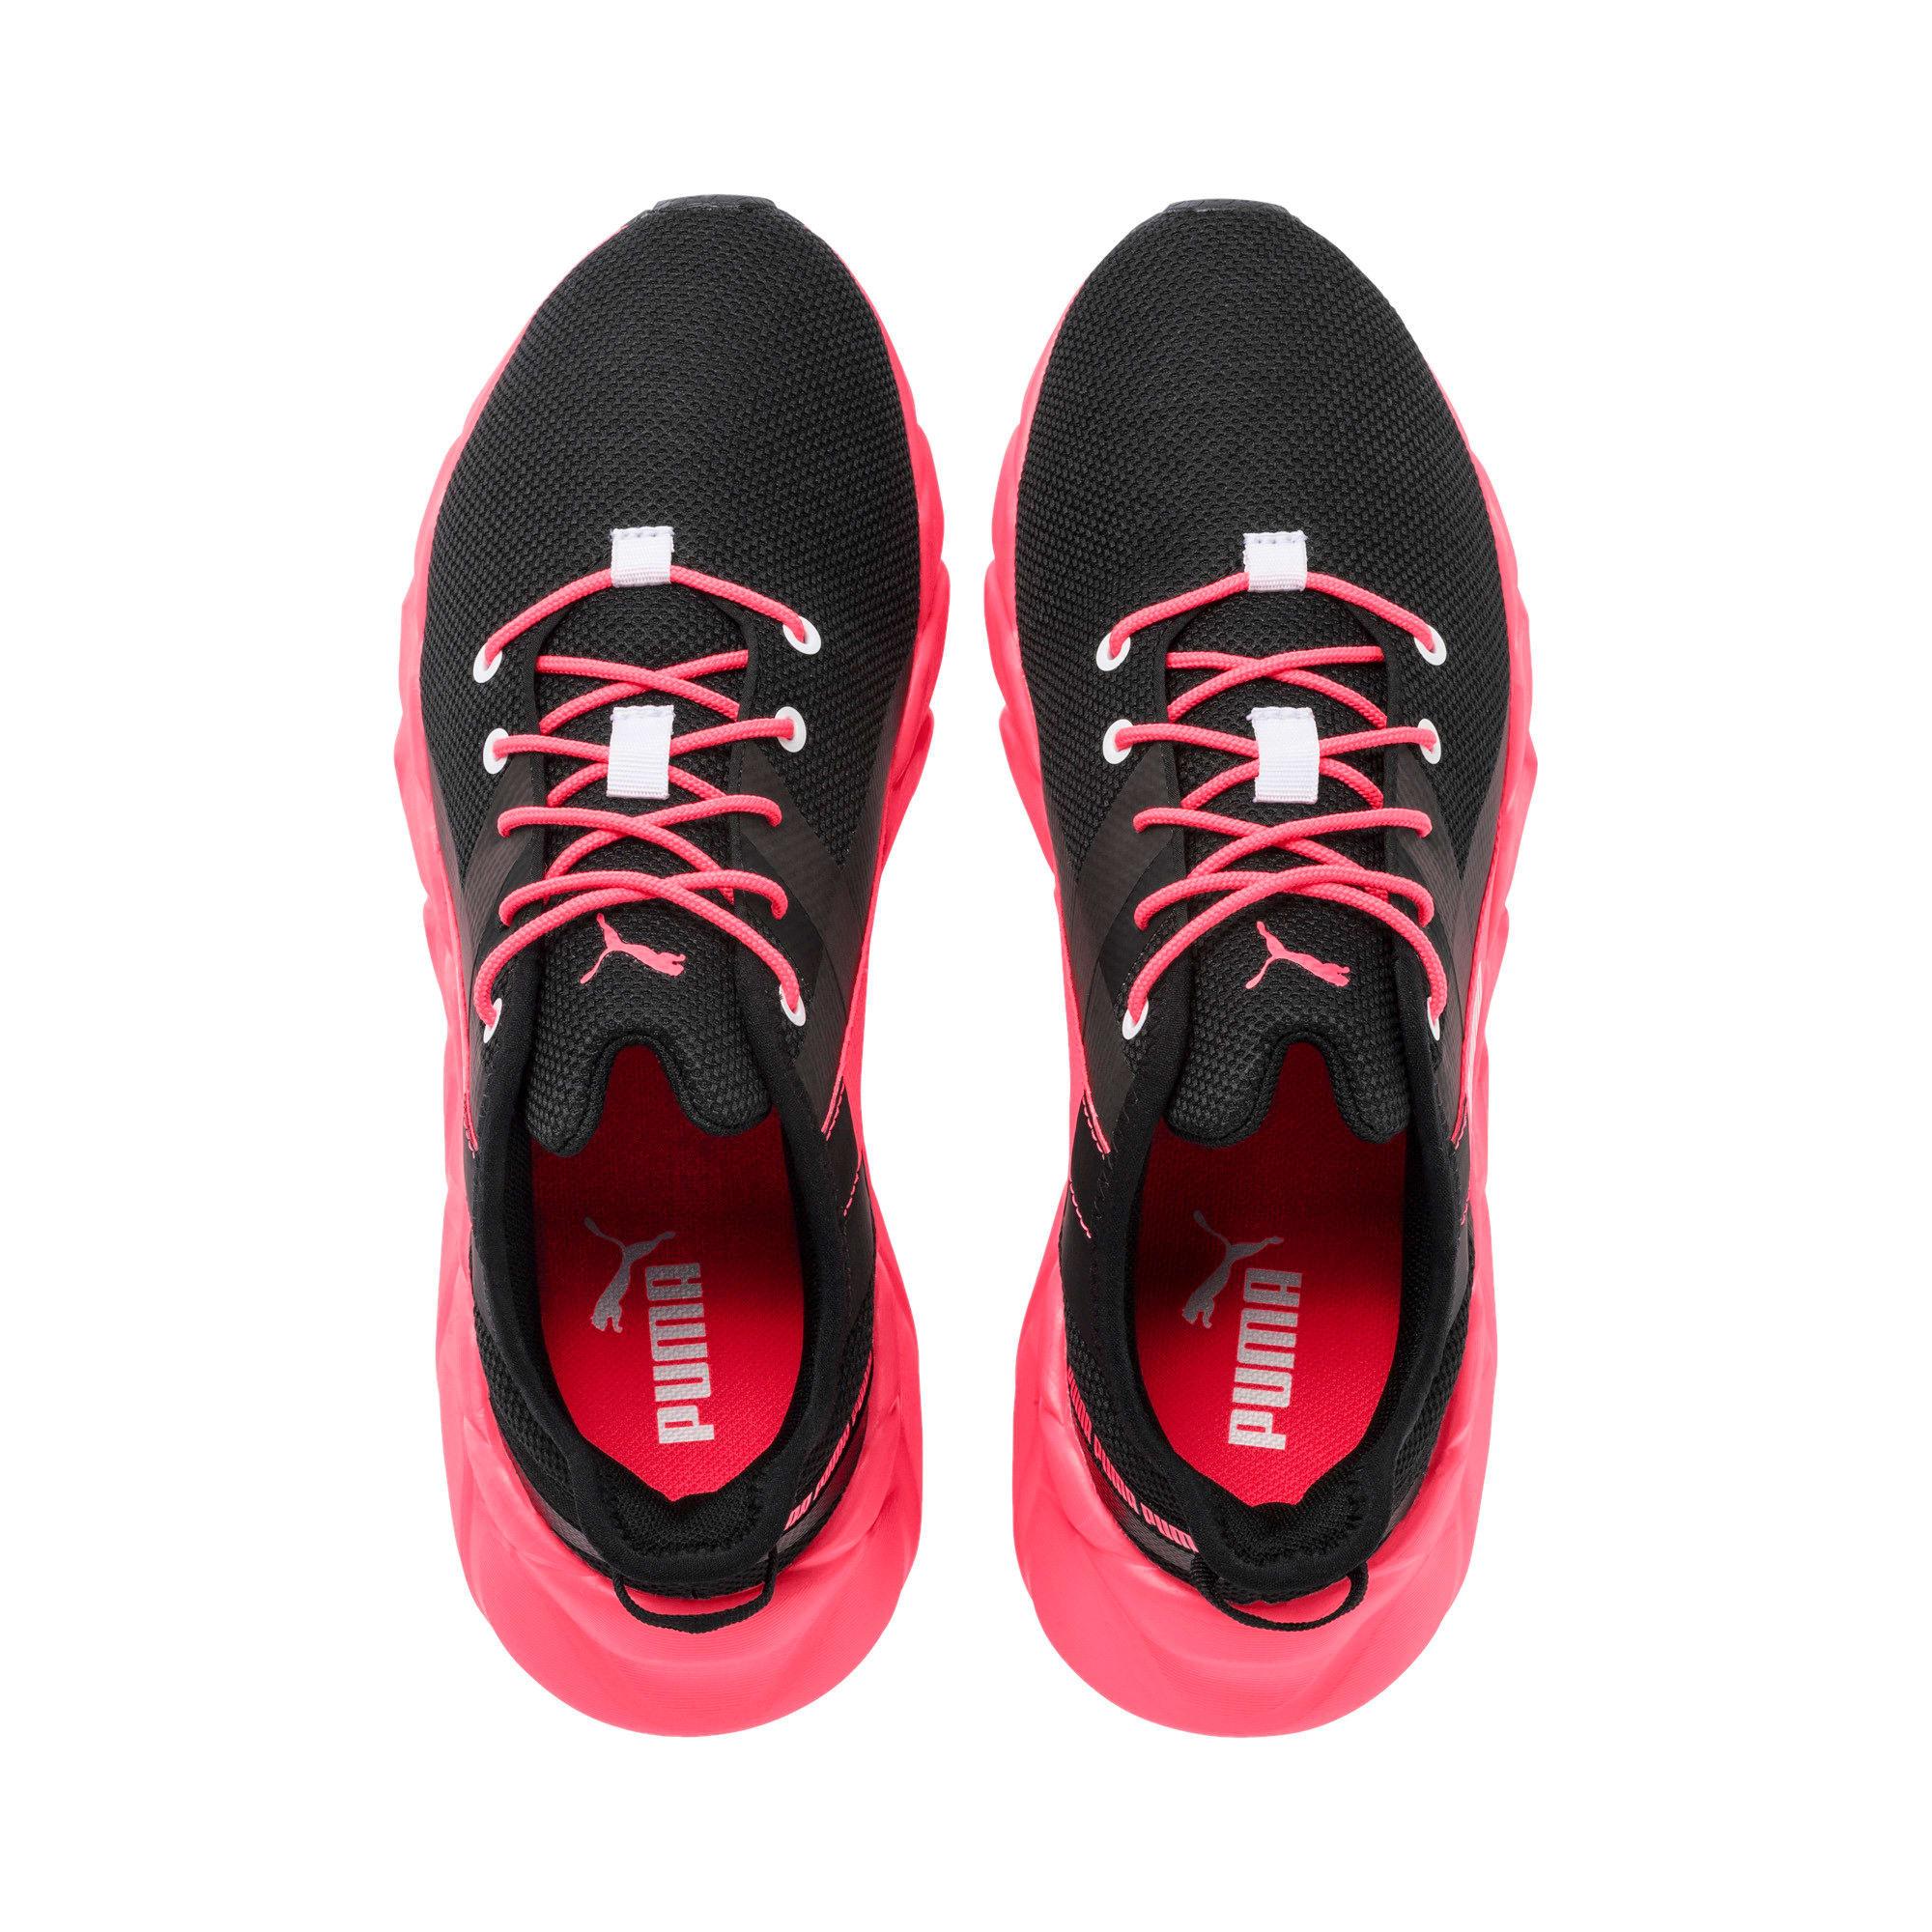 Thumbnail 10 of Weave XT Women's Training Shoes, Puma Black-Pink Alert, medium